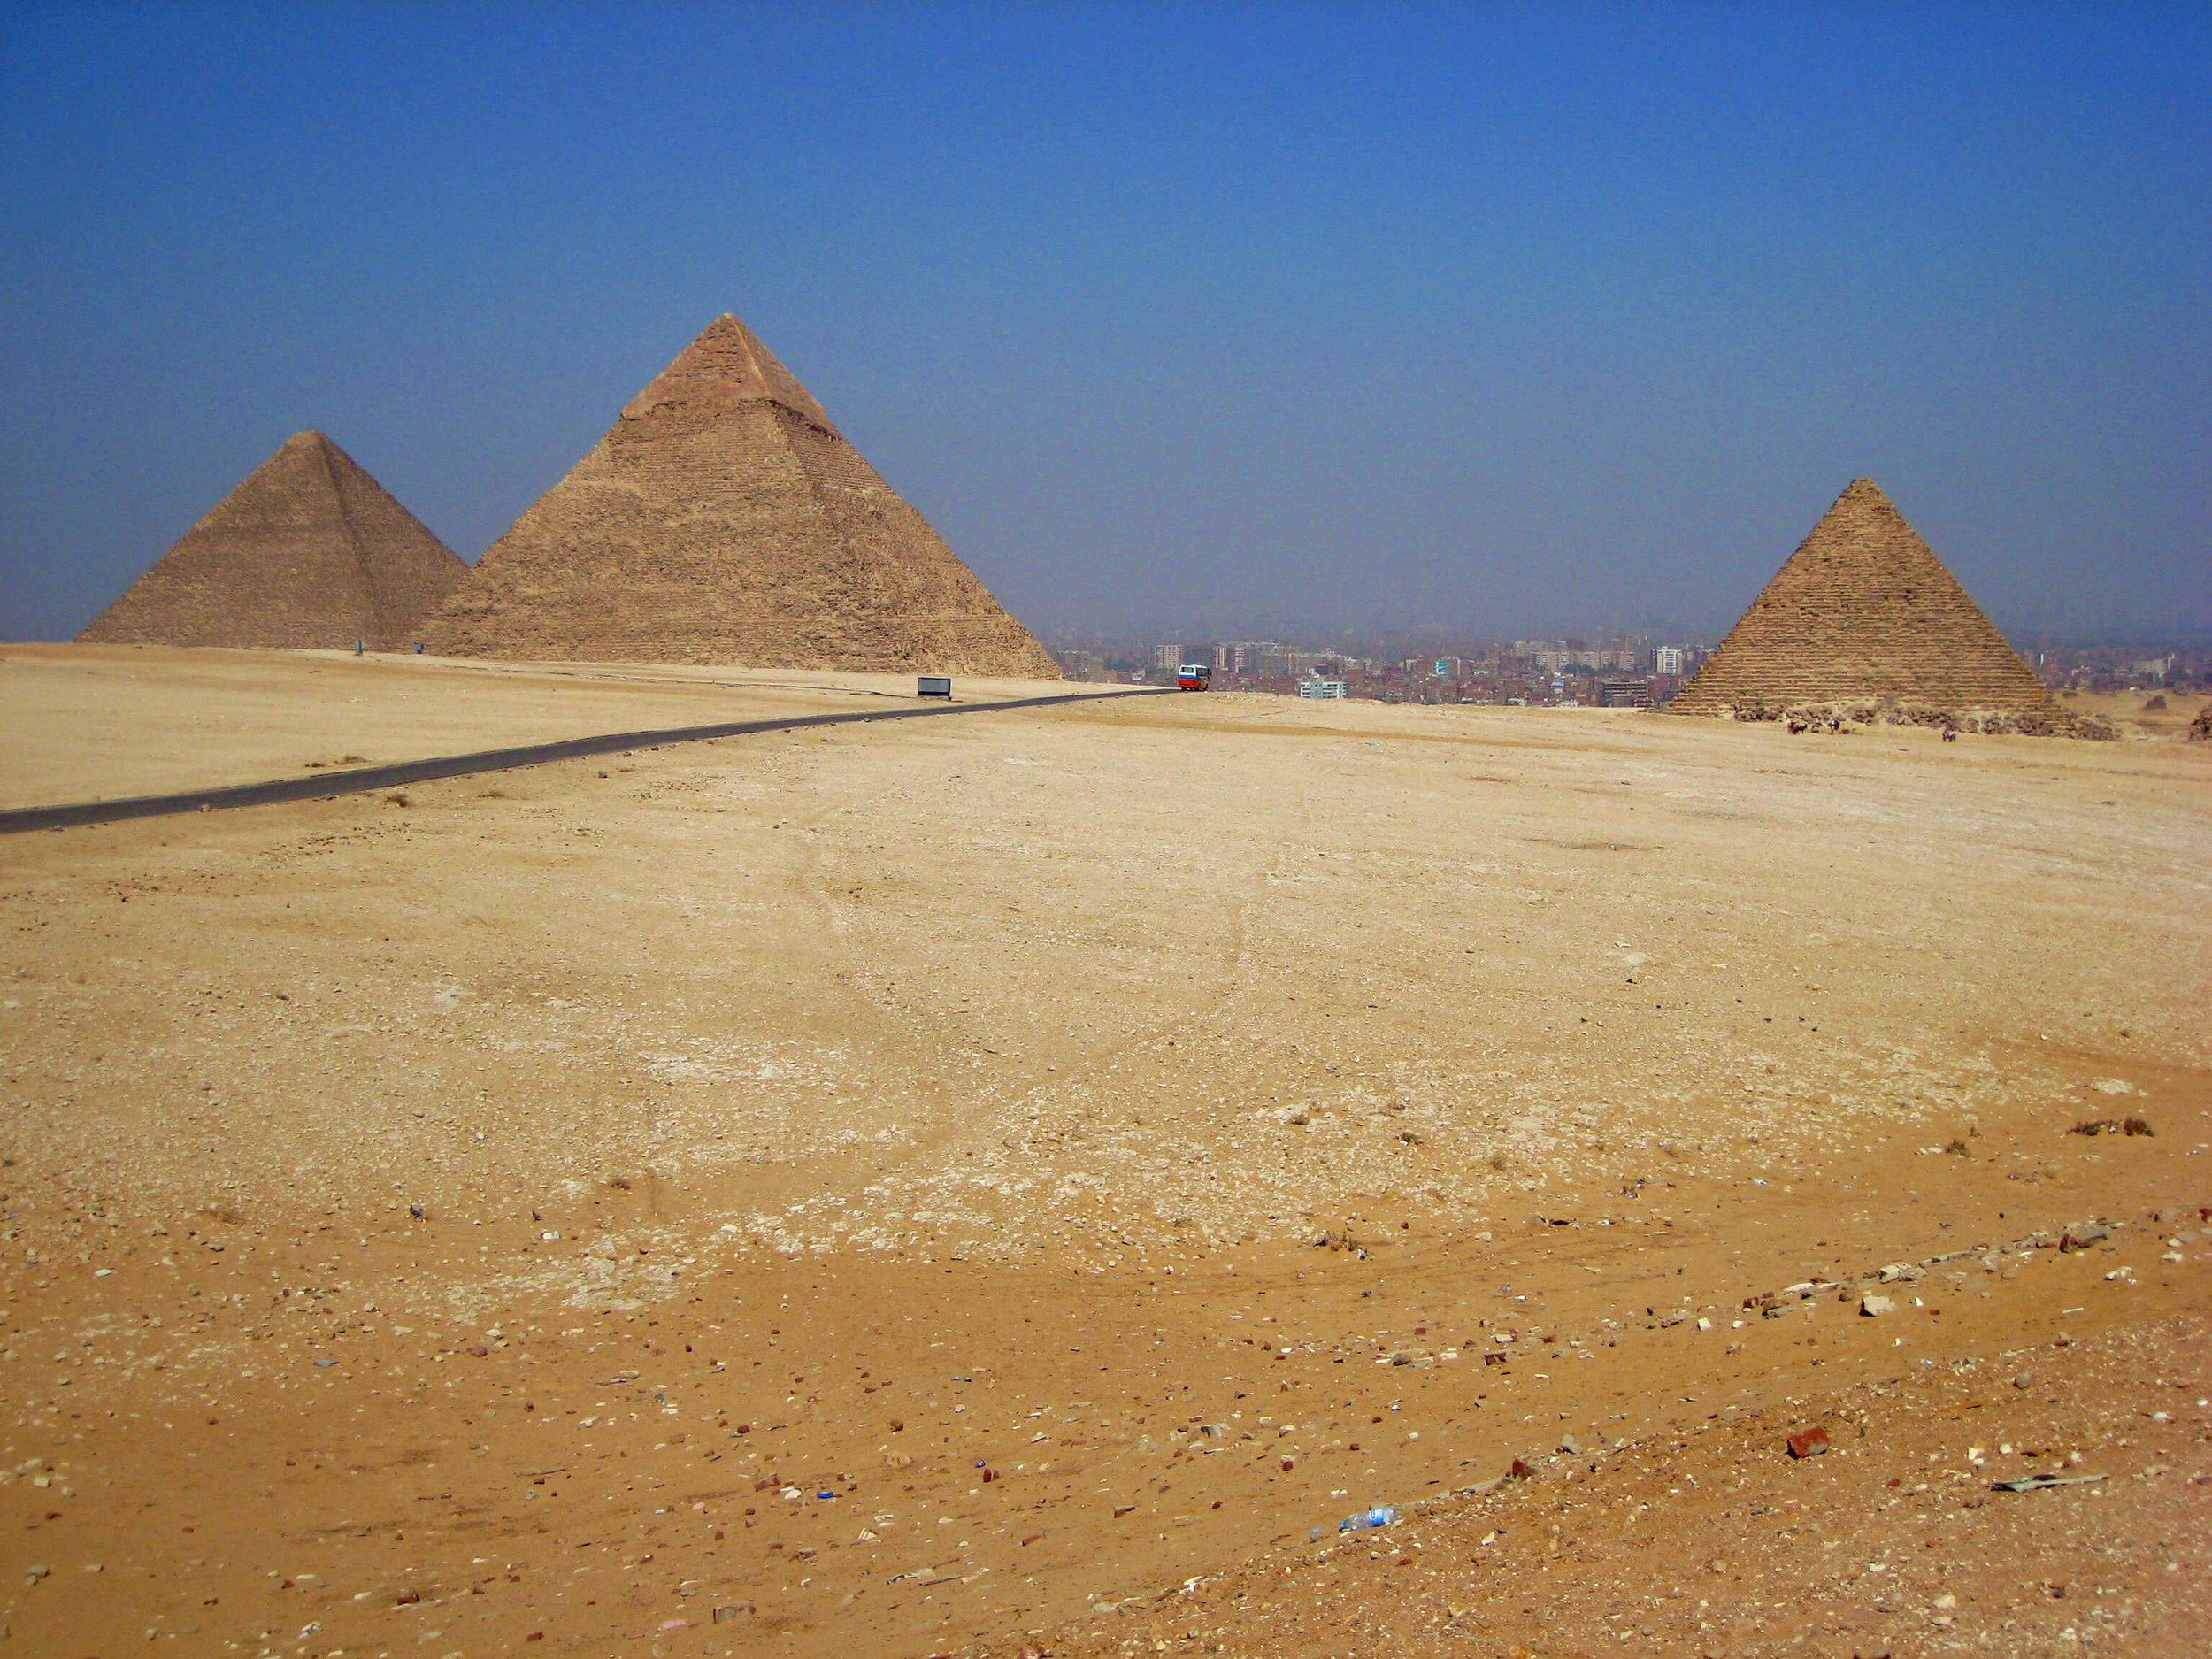 egypt-cairo-giza-pyramids-panorama.jpg